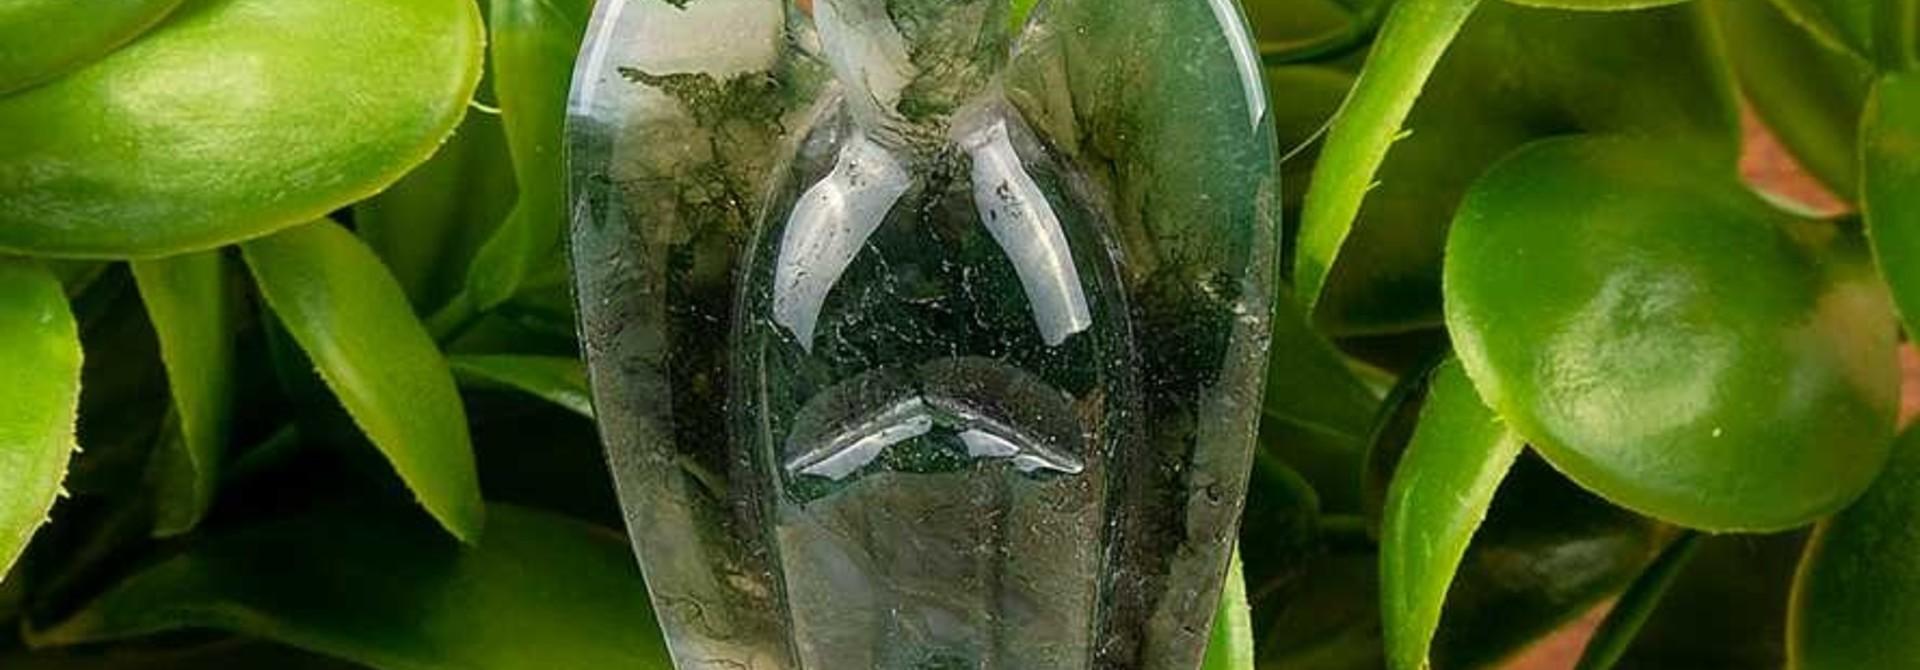 Mosagaat Engel - 5,5 cm